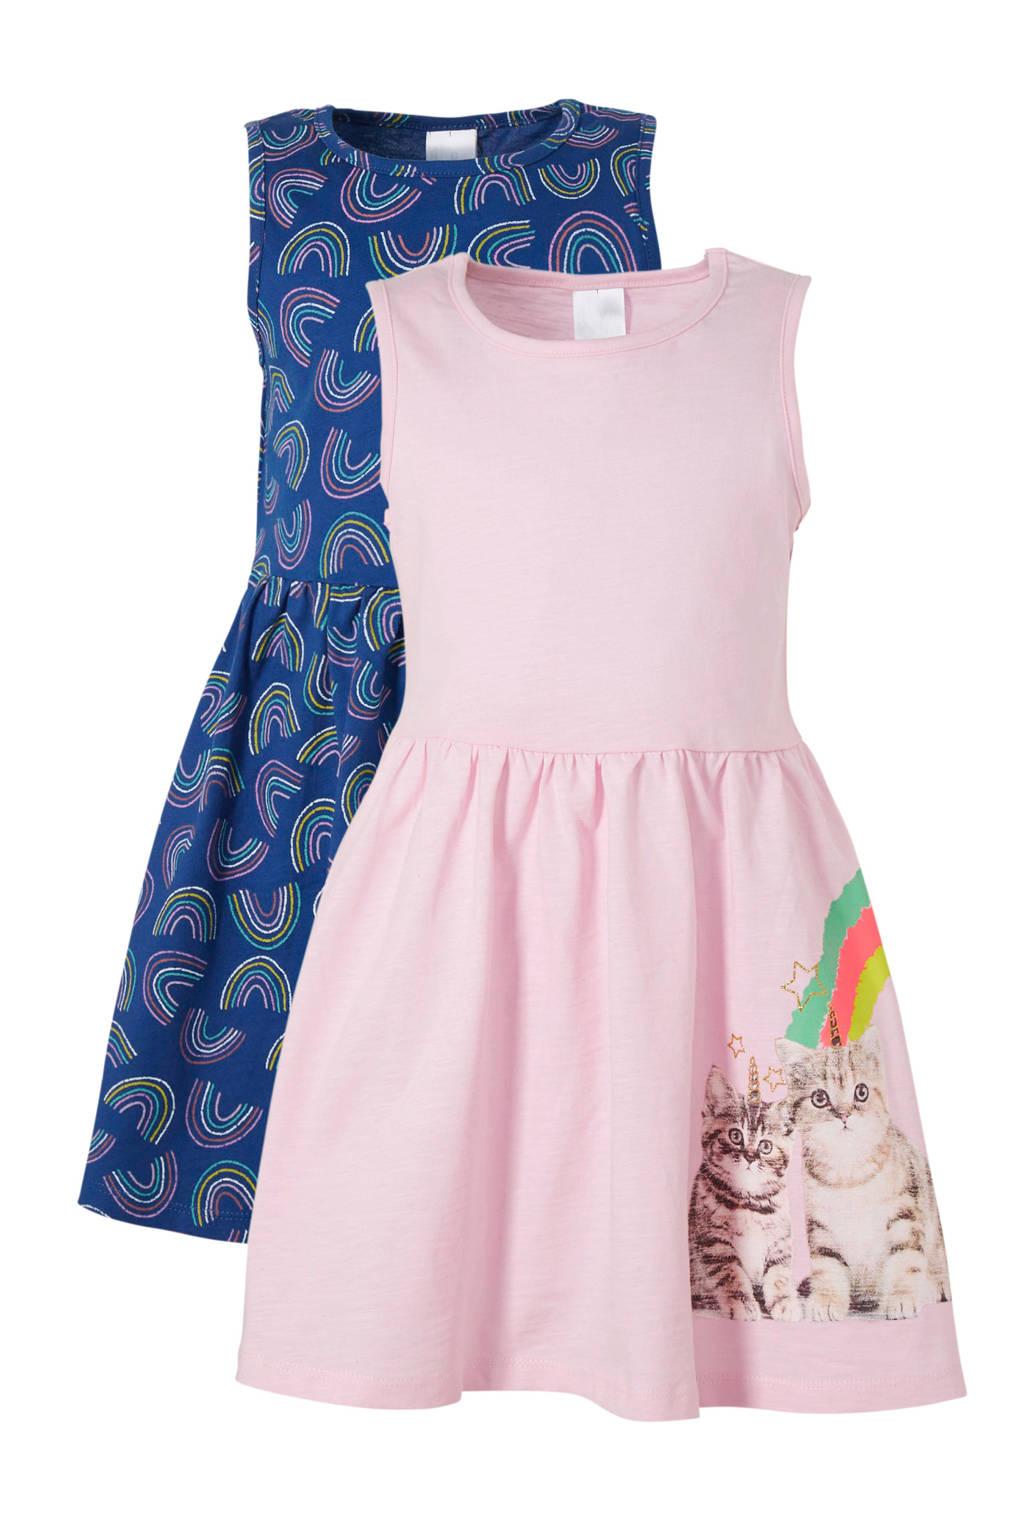 C&A Palomino jurk - set van 2, Lichtroze